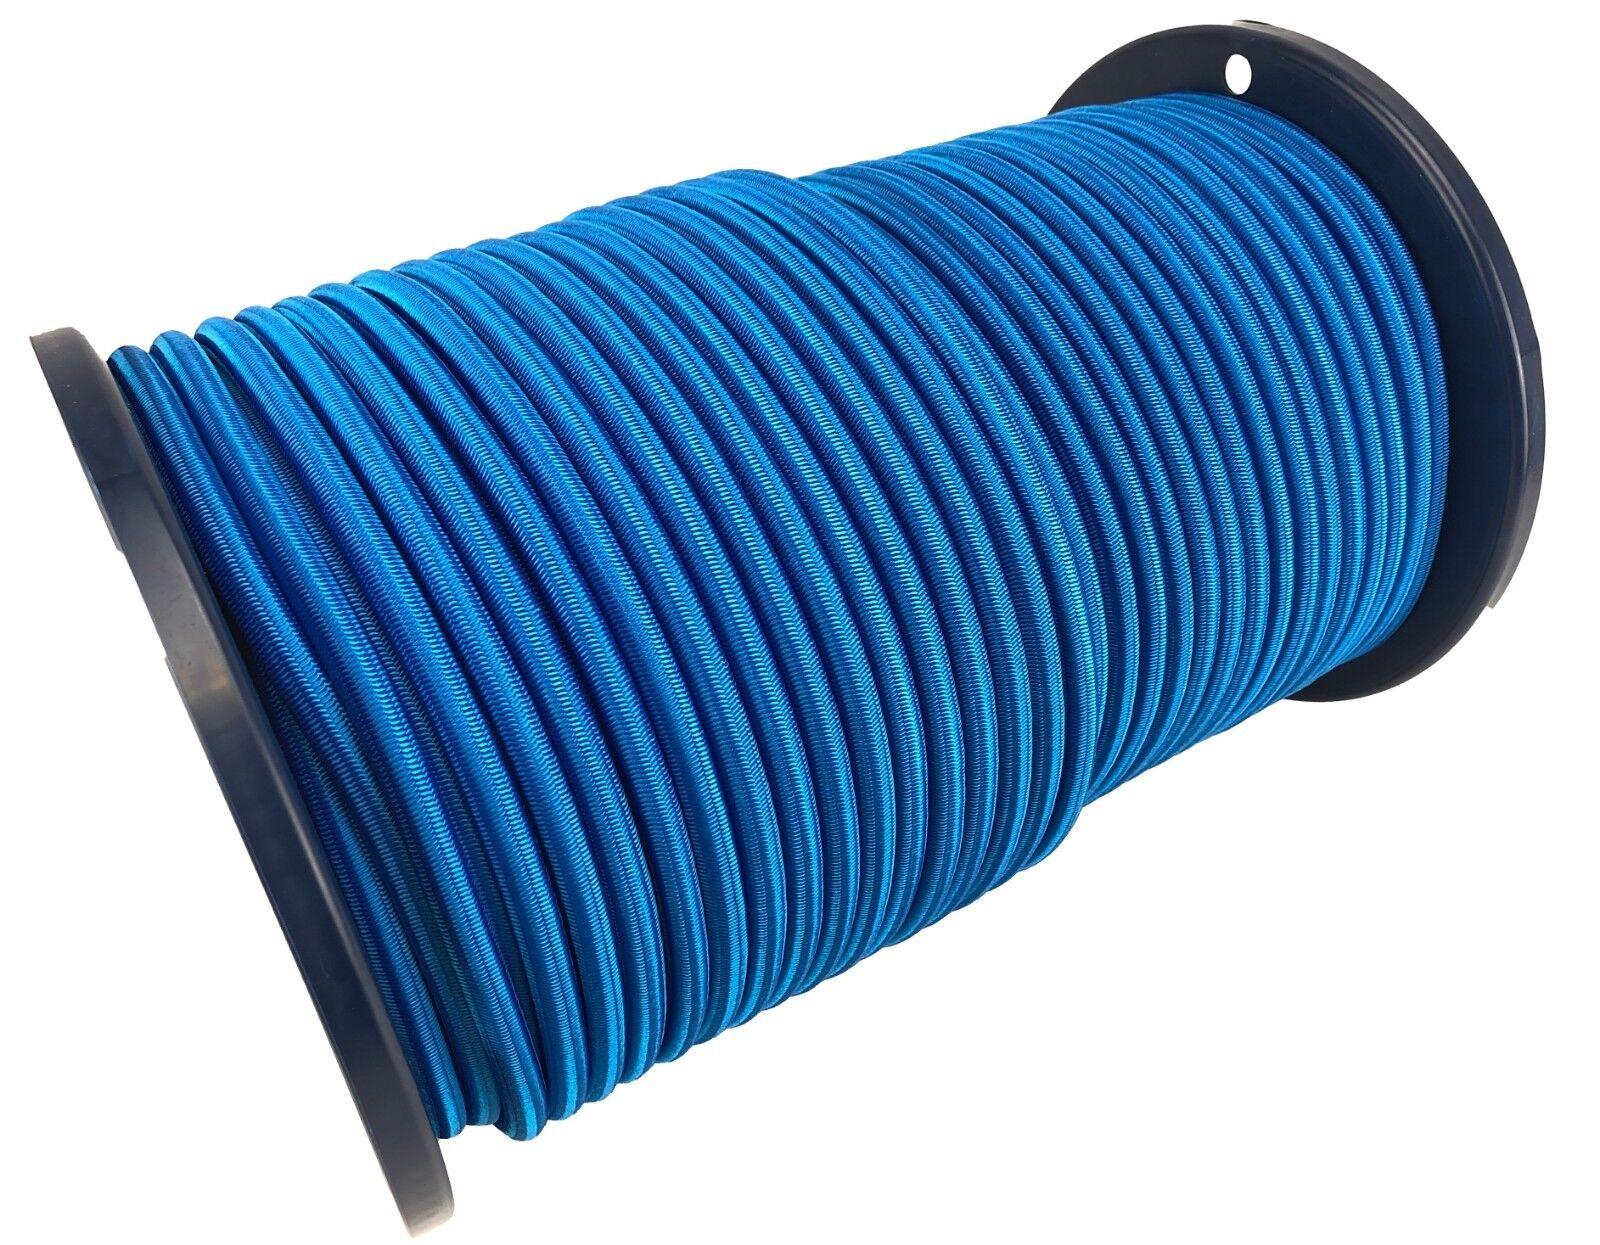 10mm Königsblau Elastischer Gummizug Seil X 100 Meter Meter Meter Krawatte Unten aa7e61